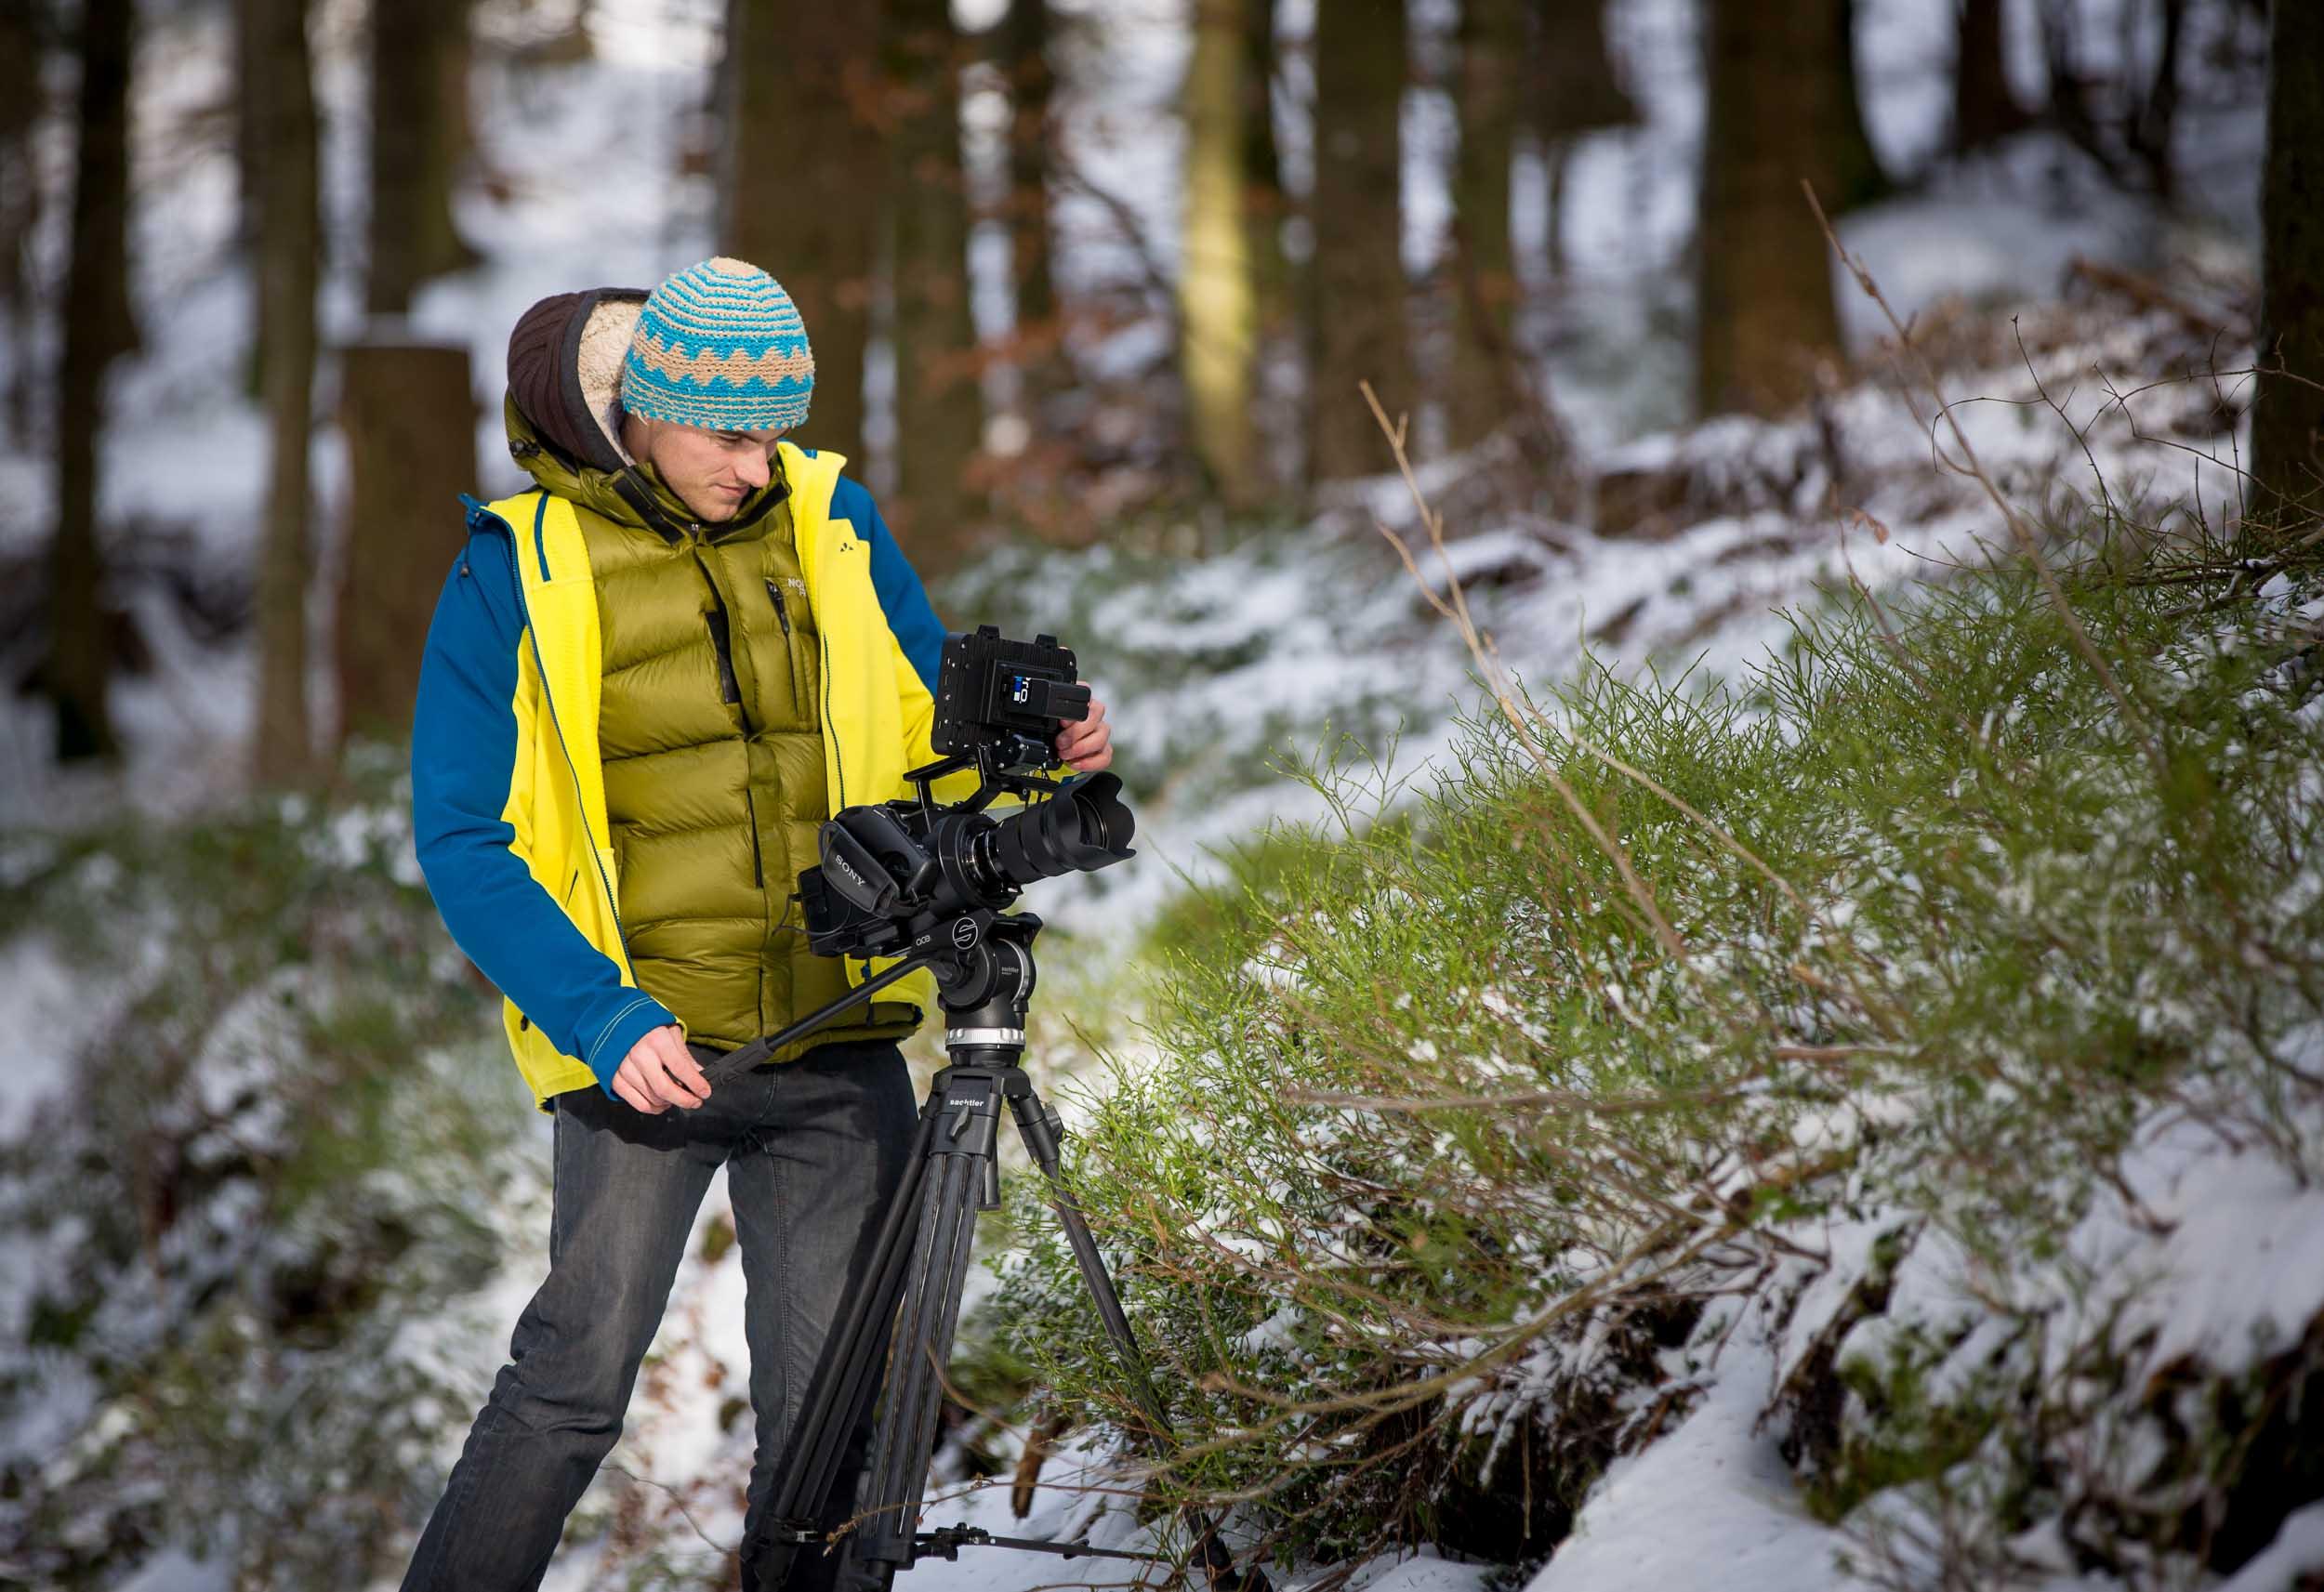 Dreharbeiten im Nationalpark Schwarzwald   Foto: Janis Klinkenberg |  Download